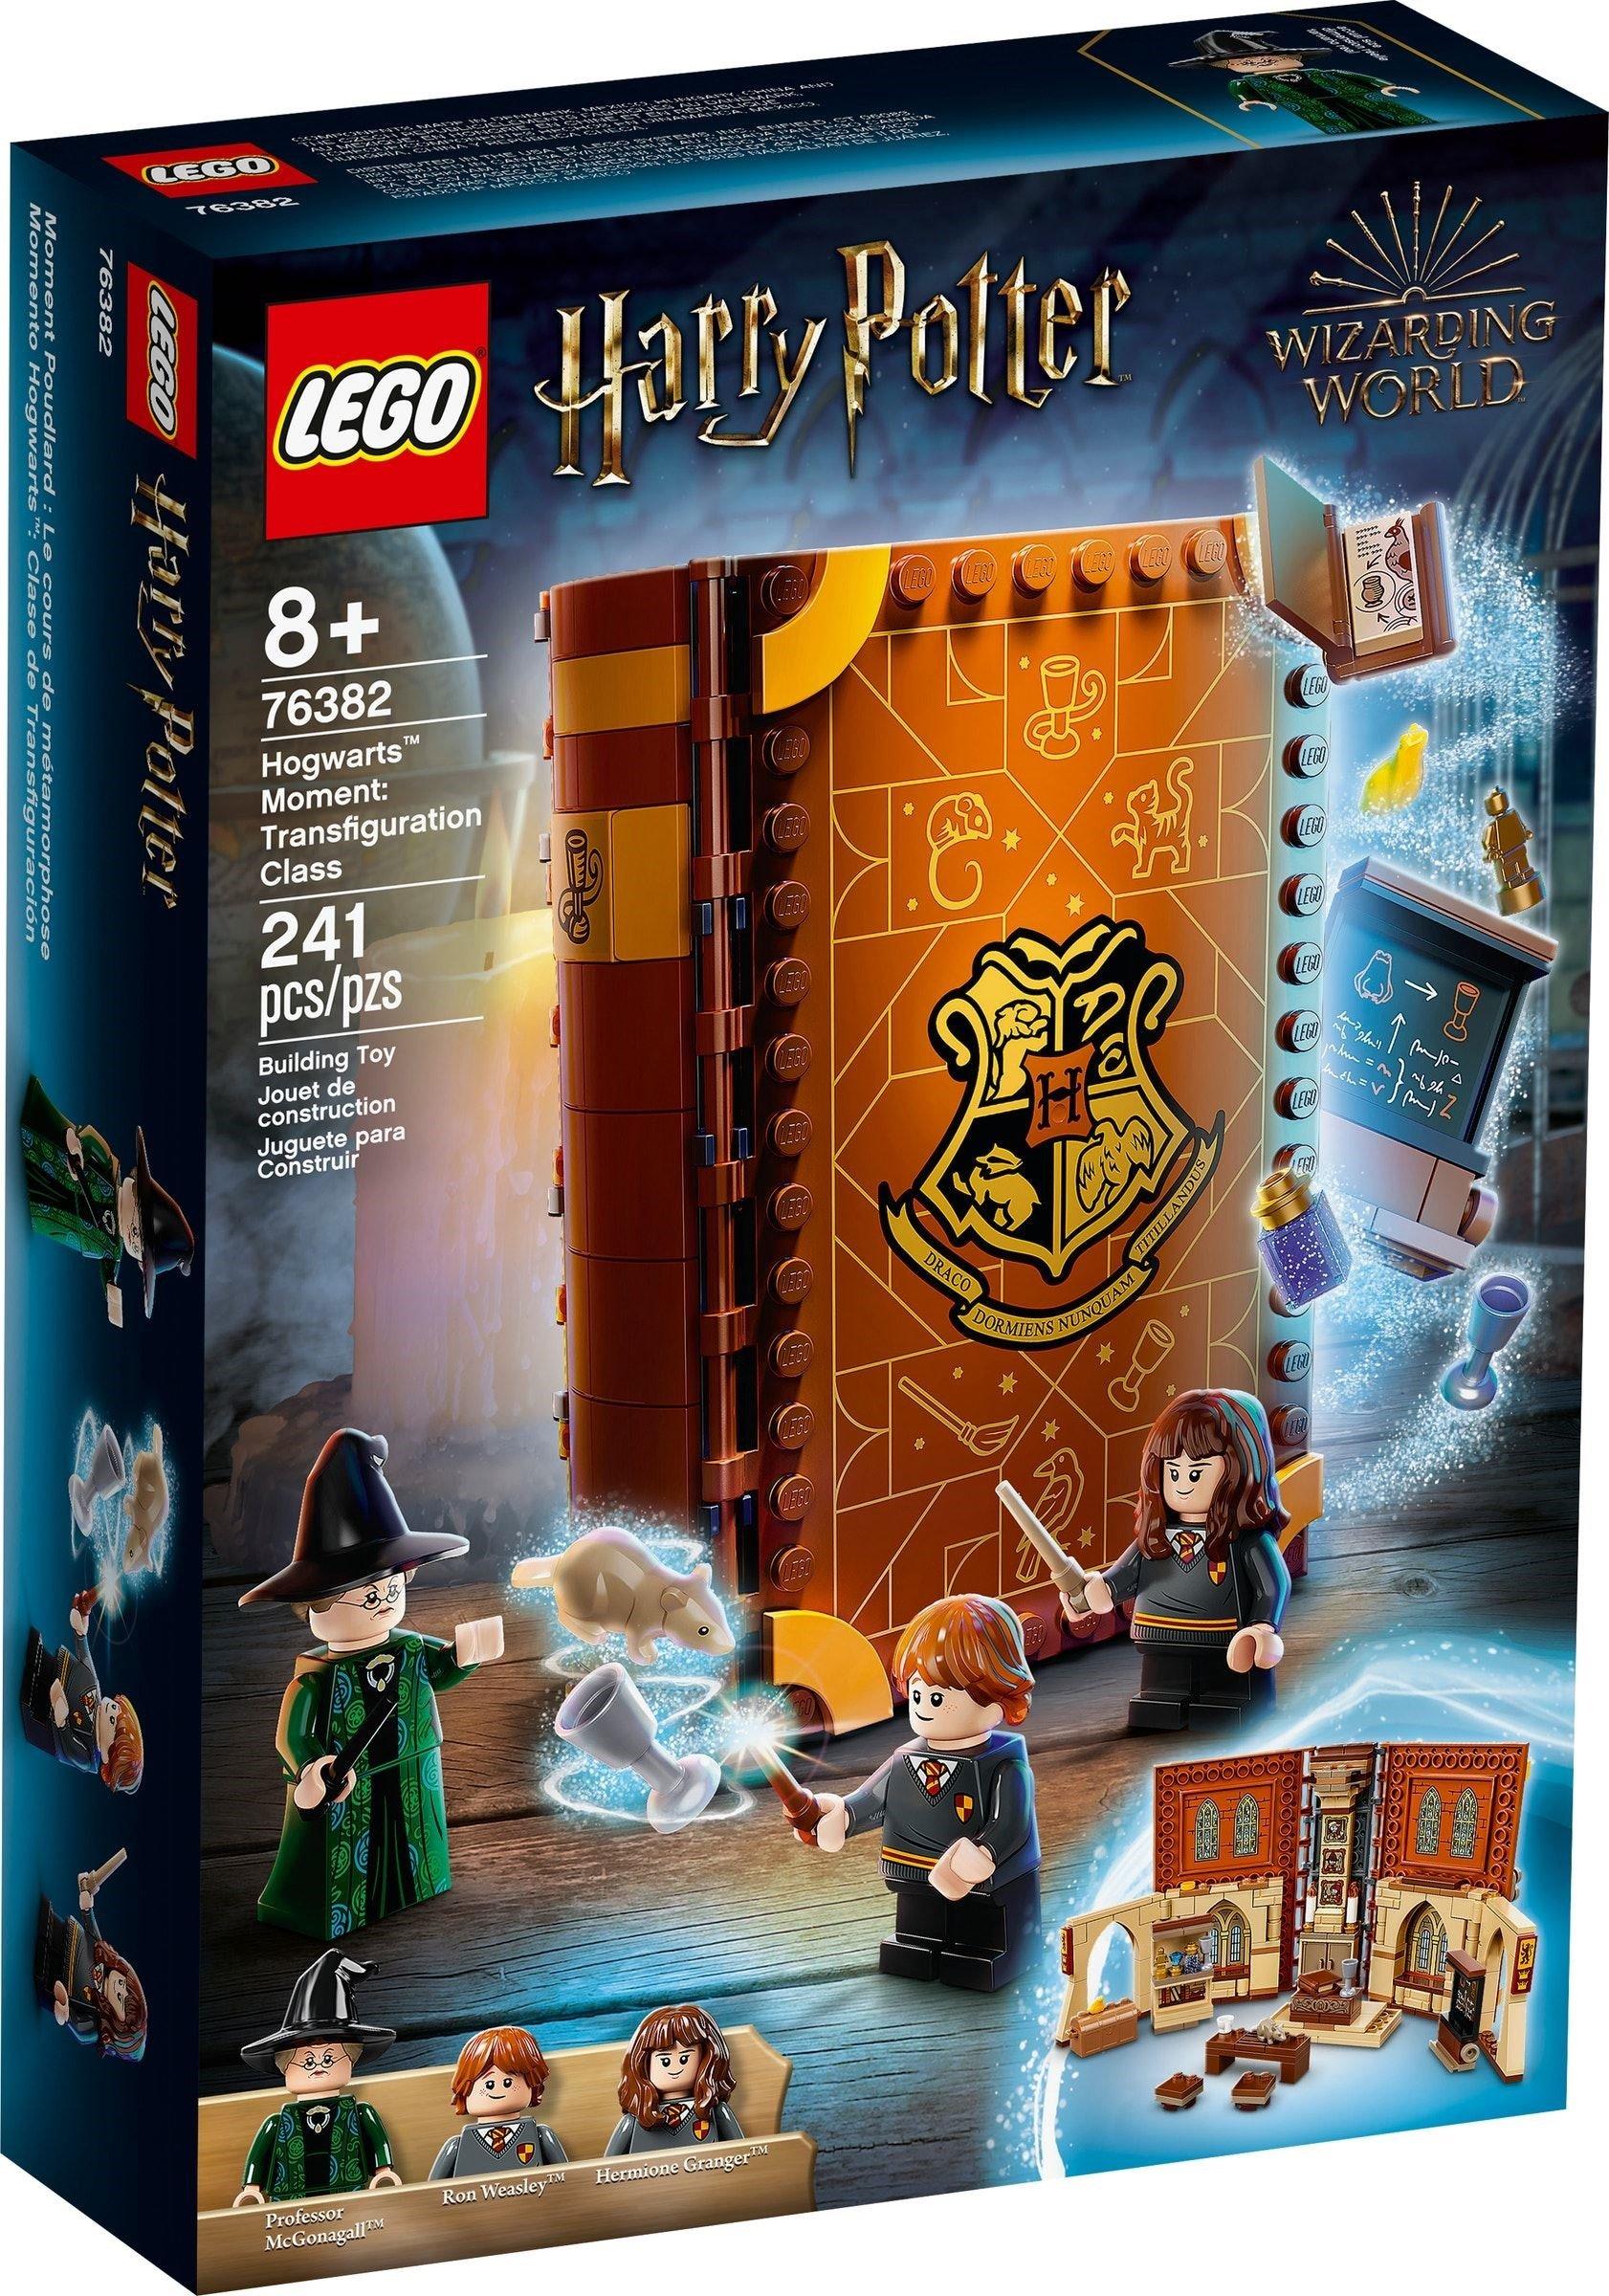 LEGO Harry Potter - Hogwarts™ Moment: Transfiguration Class (76382)